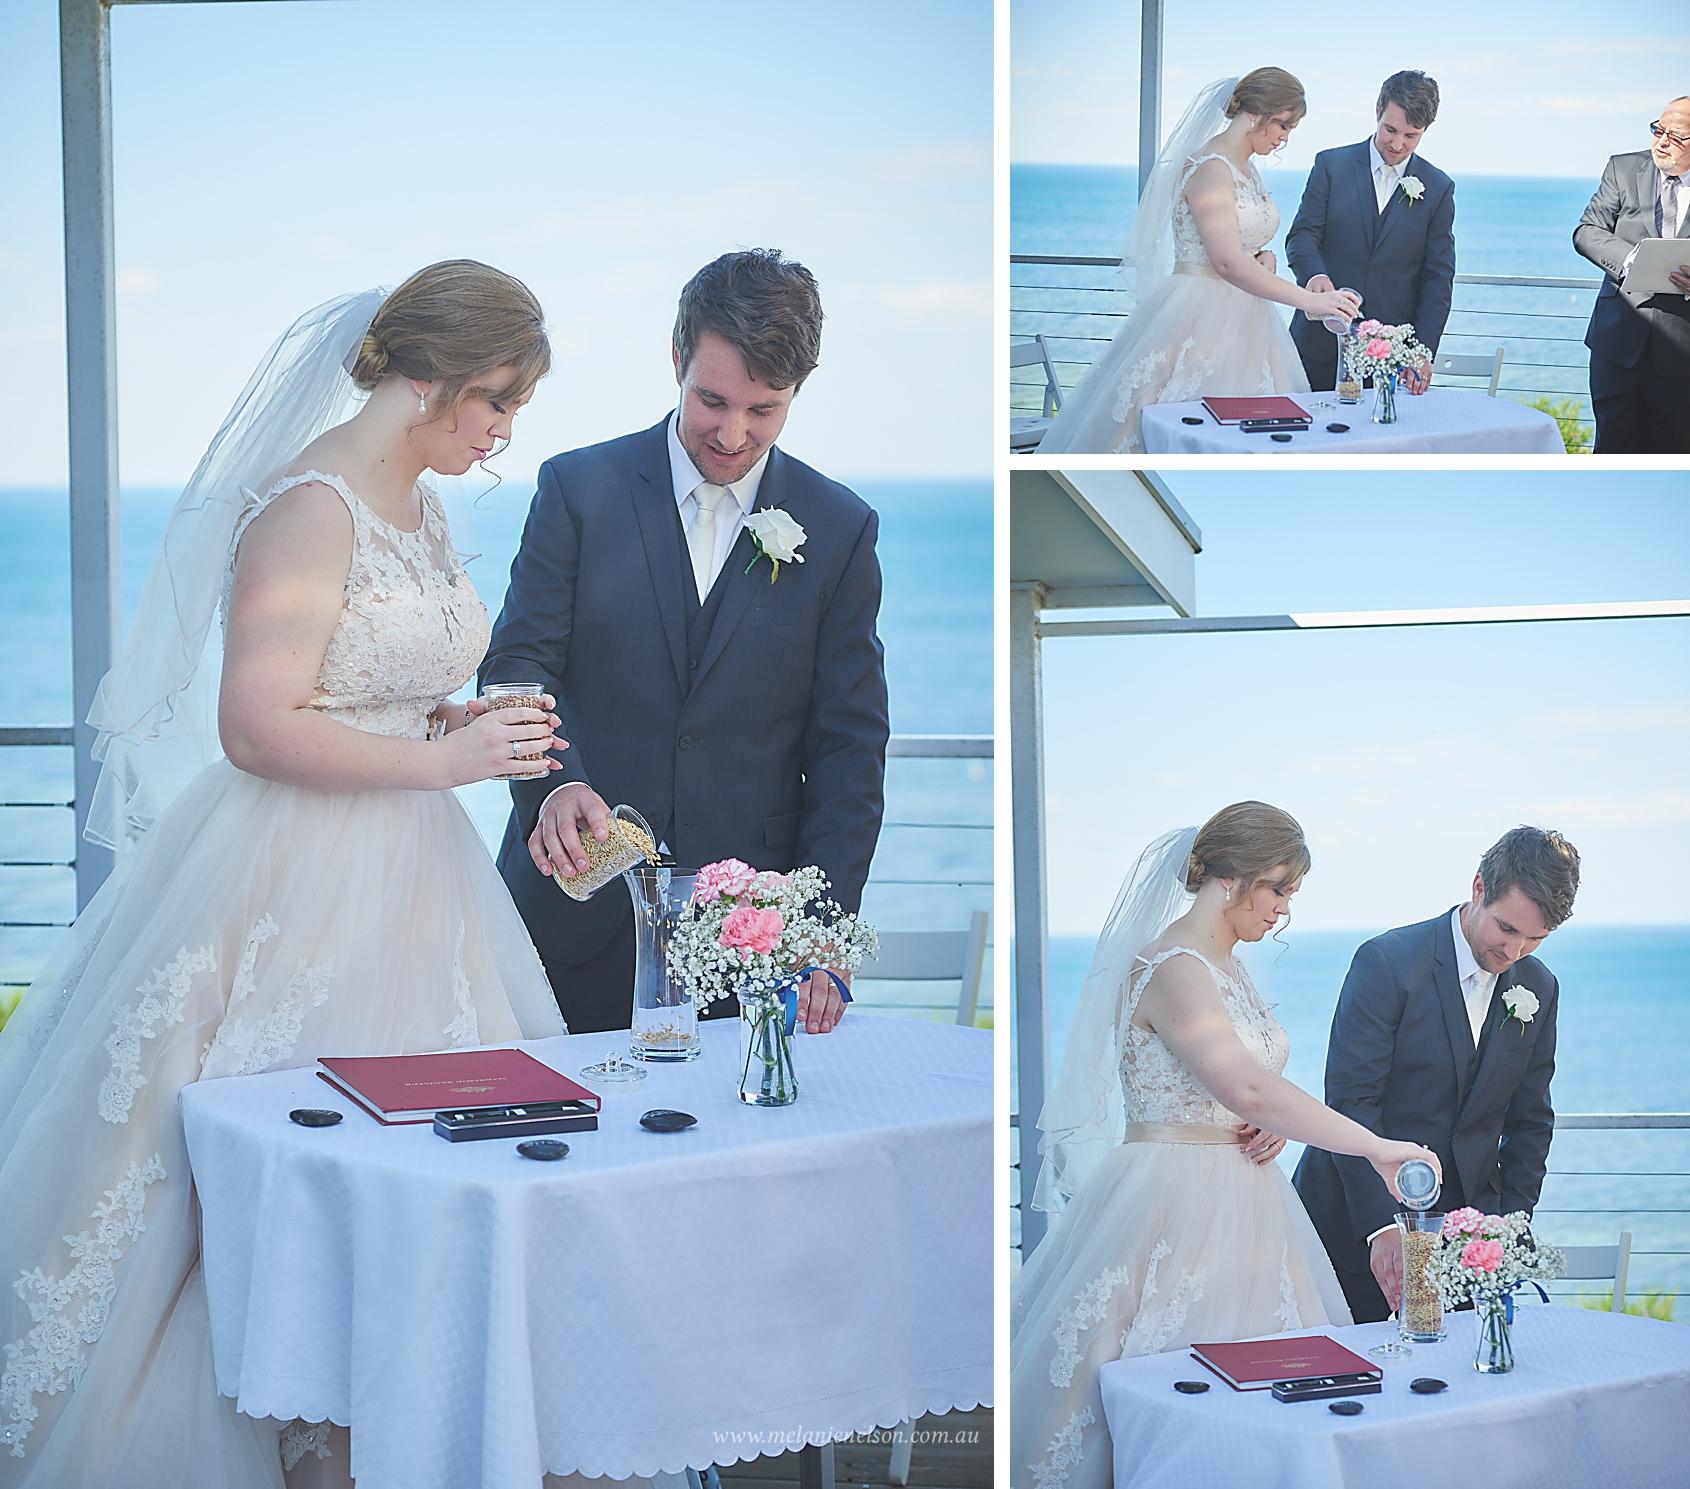 yorke_peninsula_wedding_photographer_0041.jpg